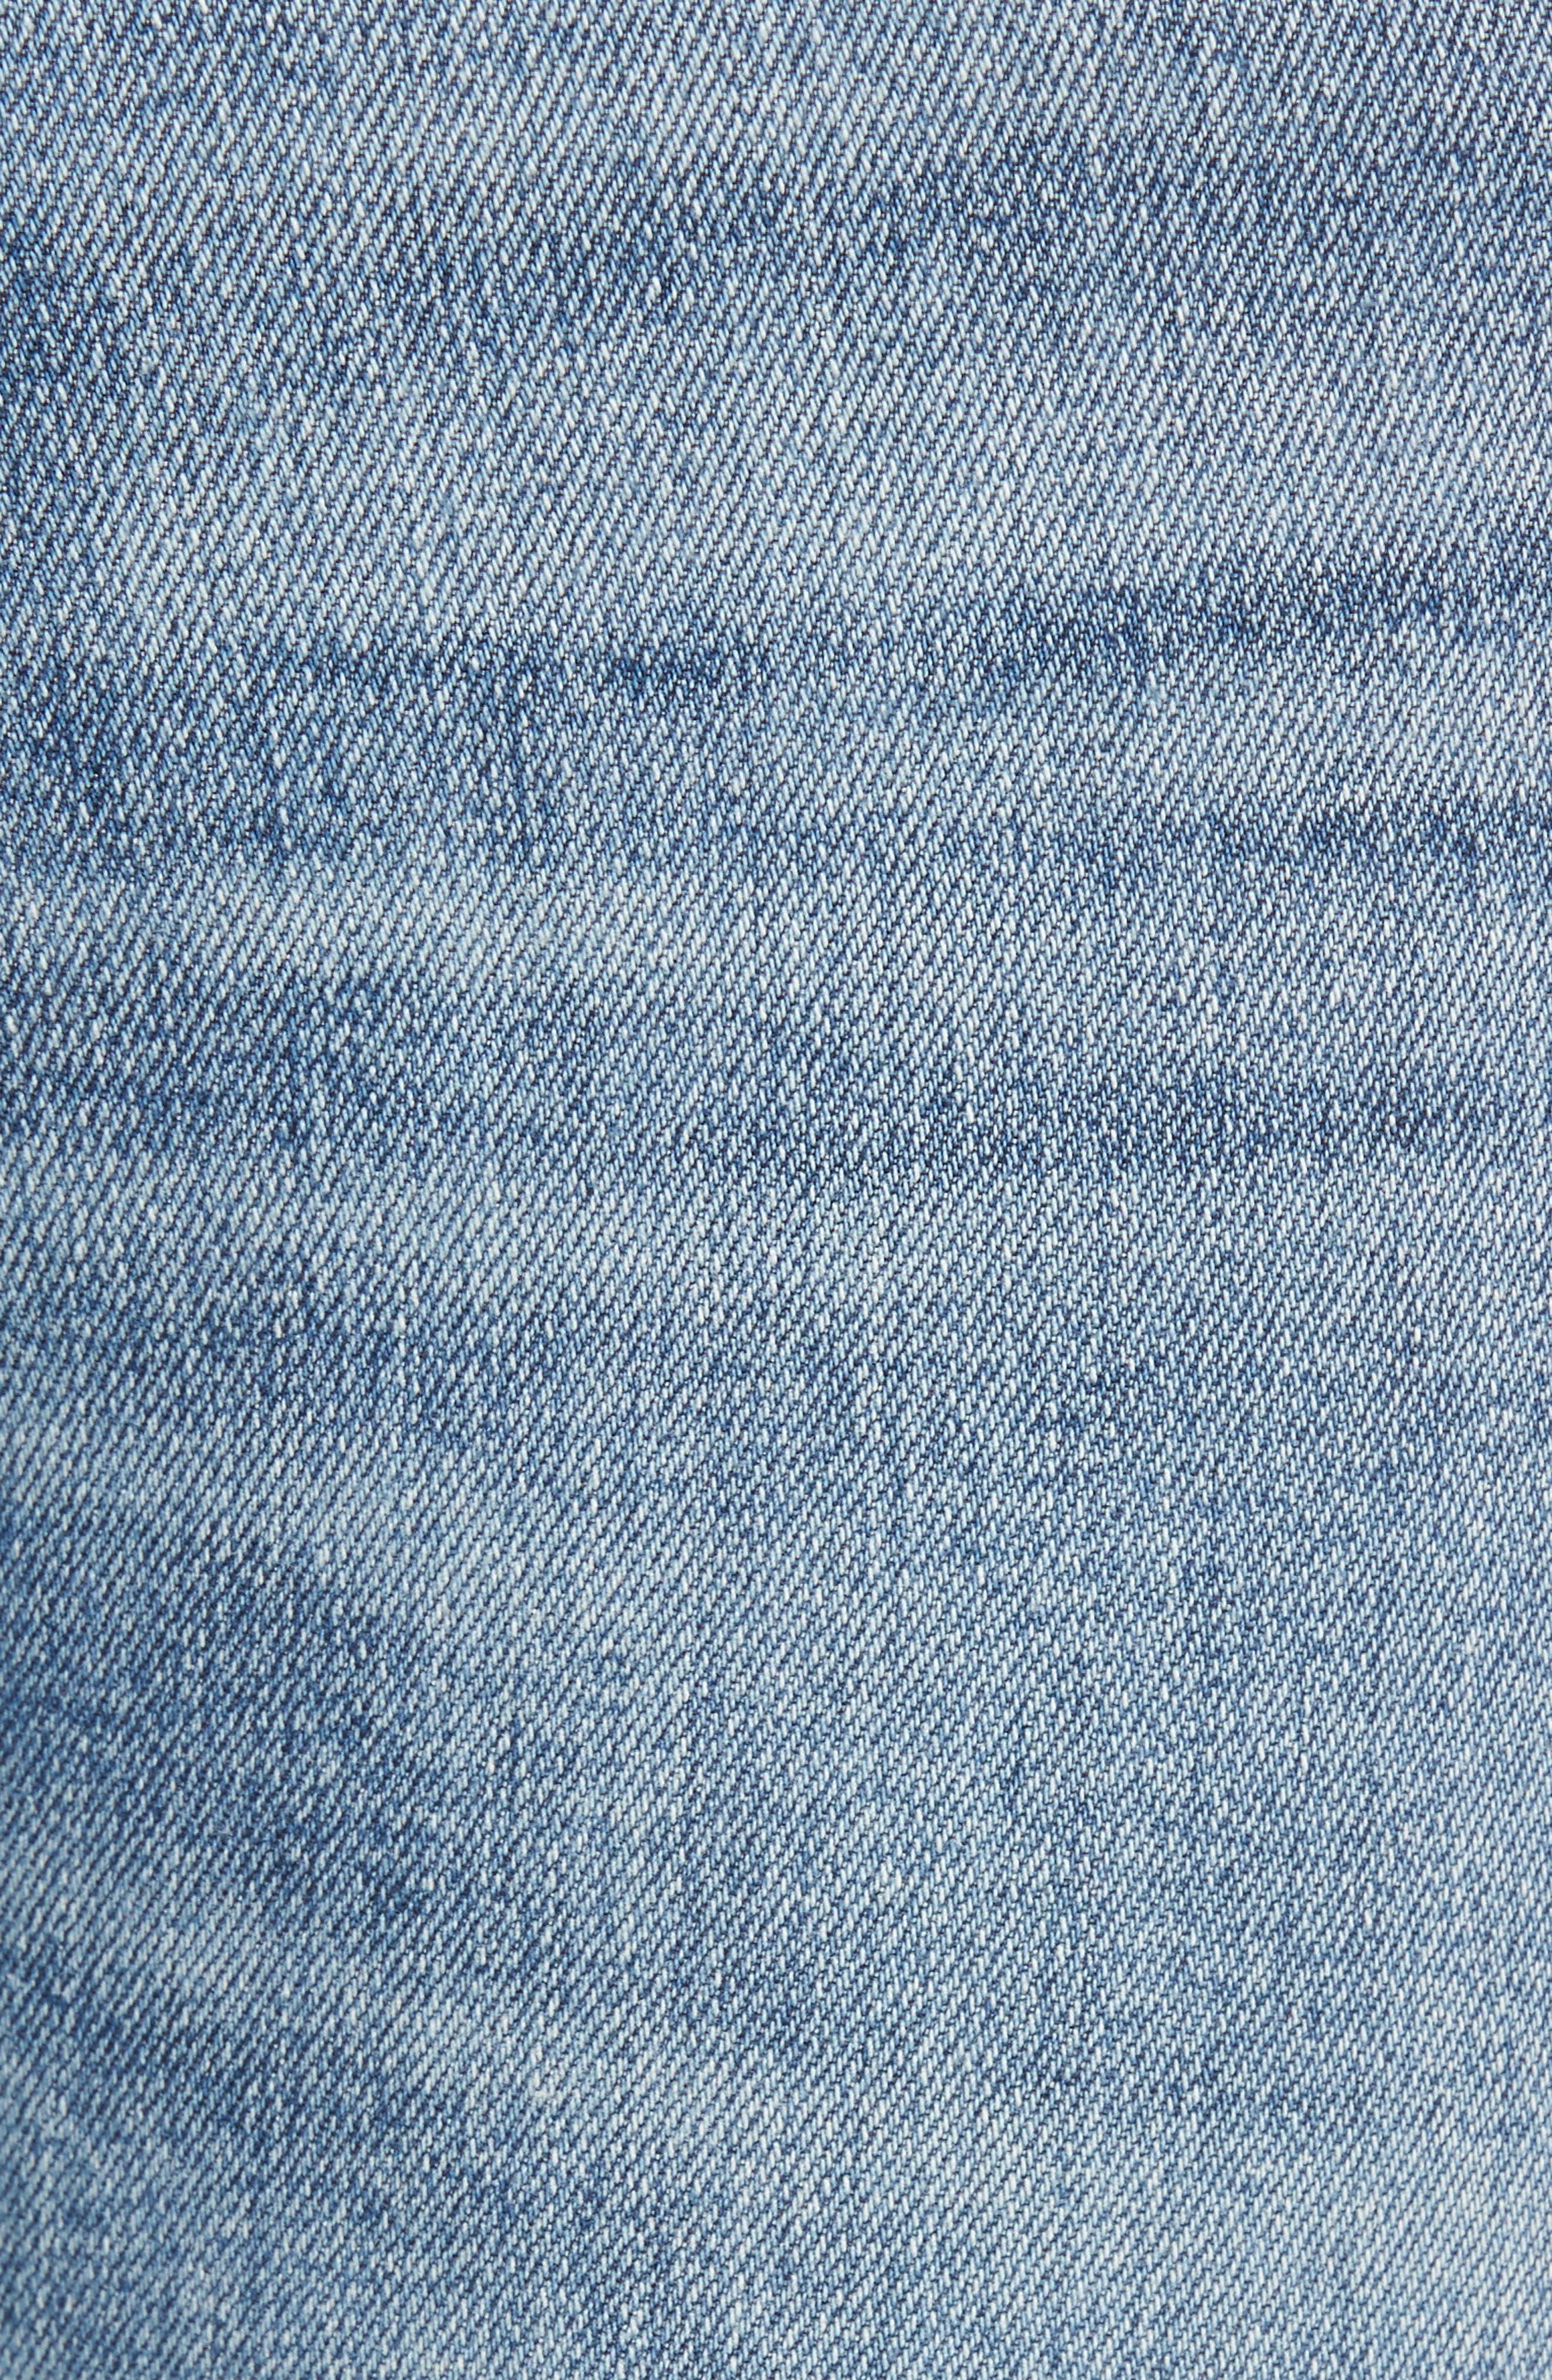 Alternate Image 5  - AGOLDE Sophie Distressed High Waist Skinny Jeans (Outsider)